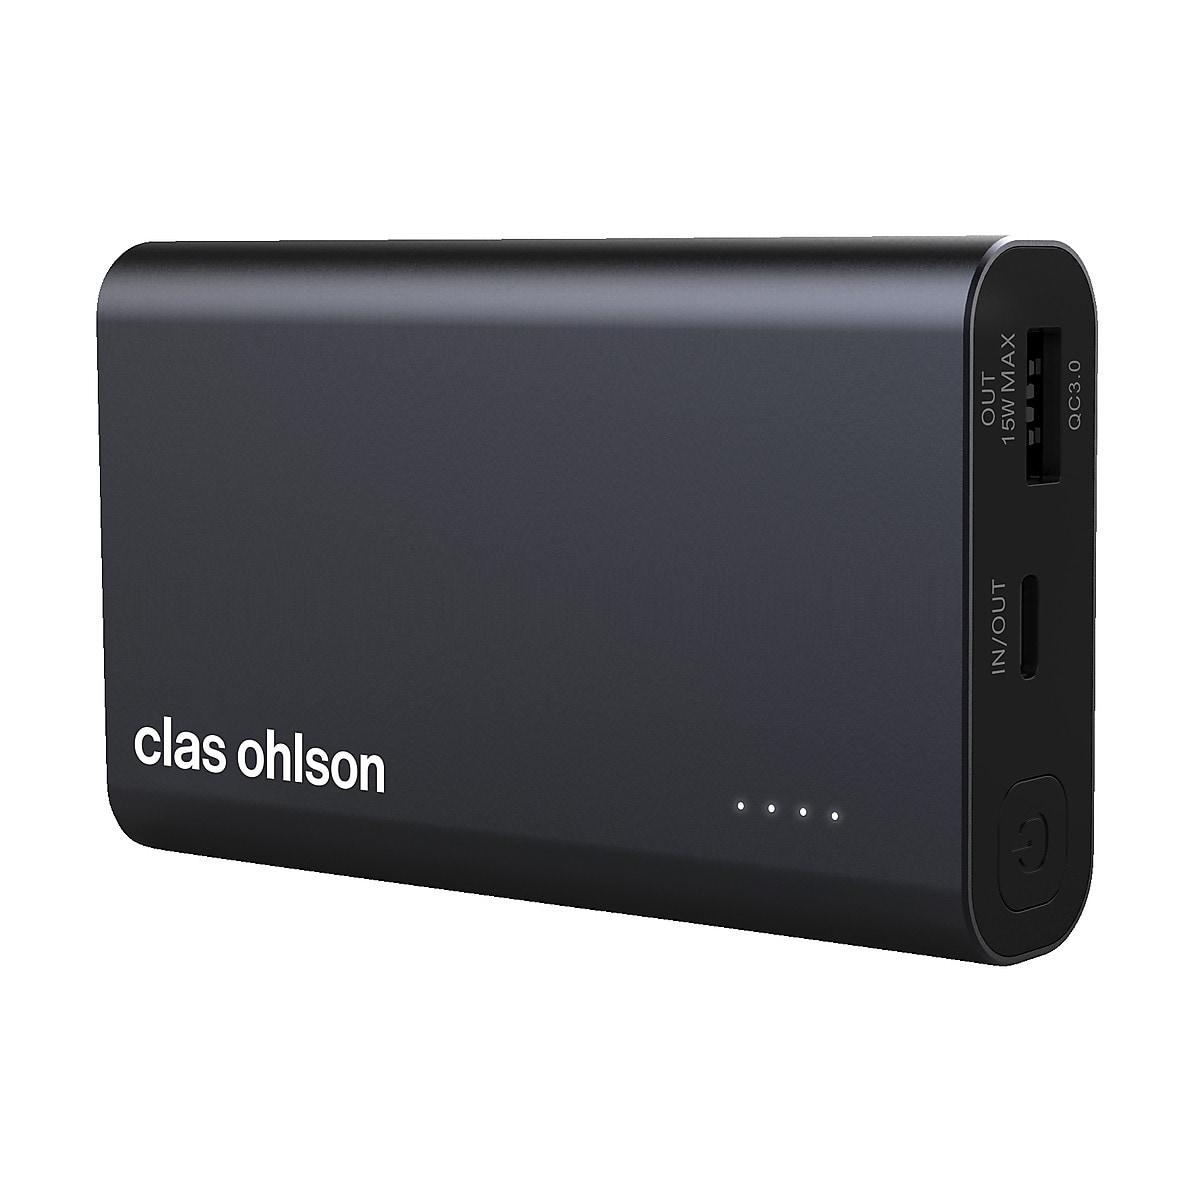 Clas Ohlson USB-C Powerbank 10050 mAh